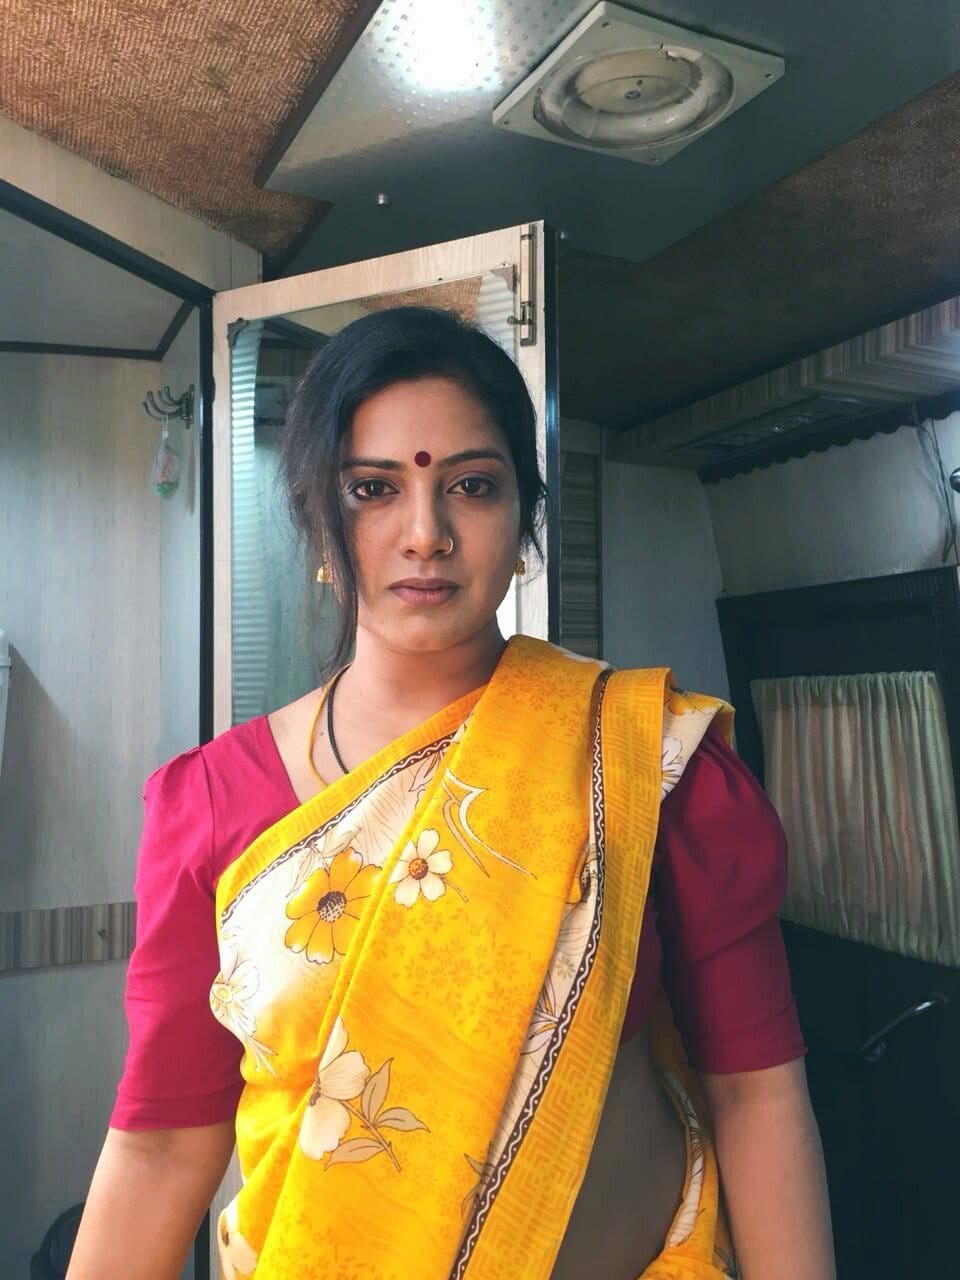 Kavita Radheshyam Fan Photos | Kavita Radheshyam Pictures, Images - 67445 - FilmiBeat